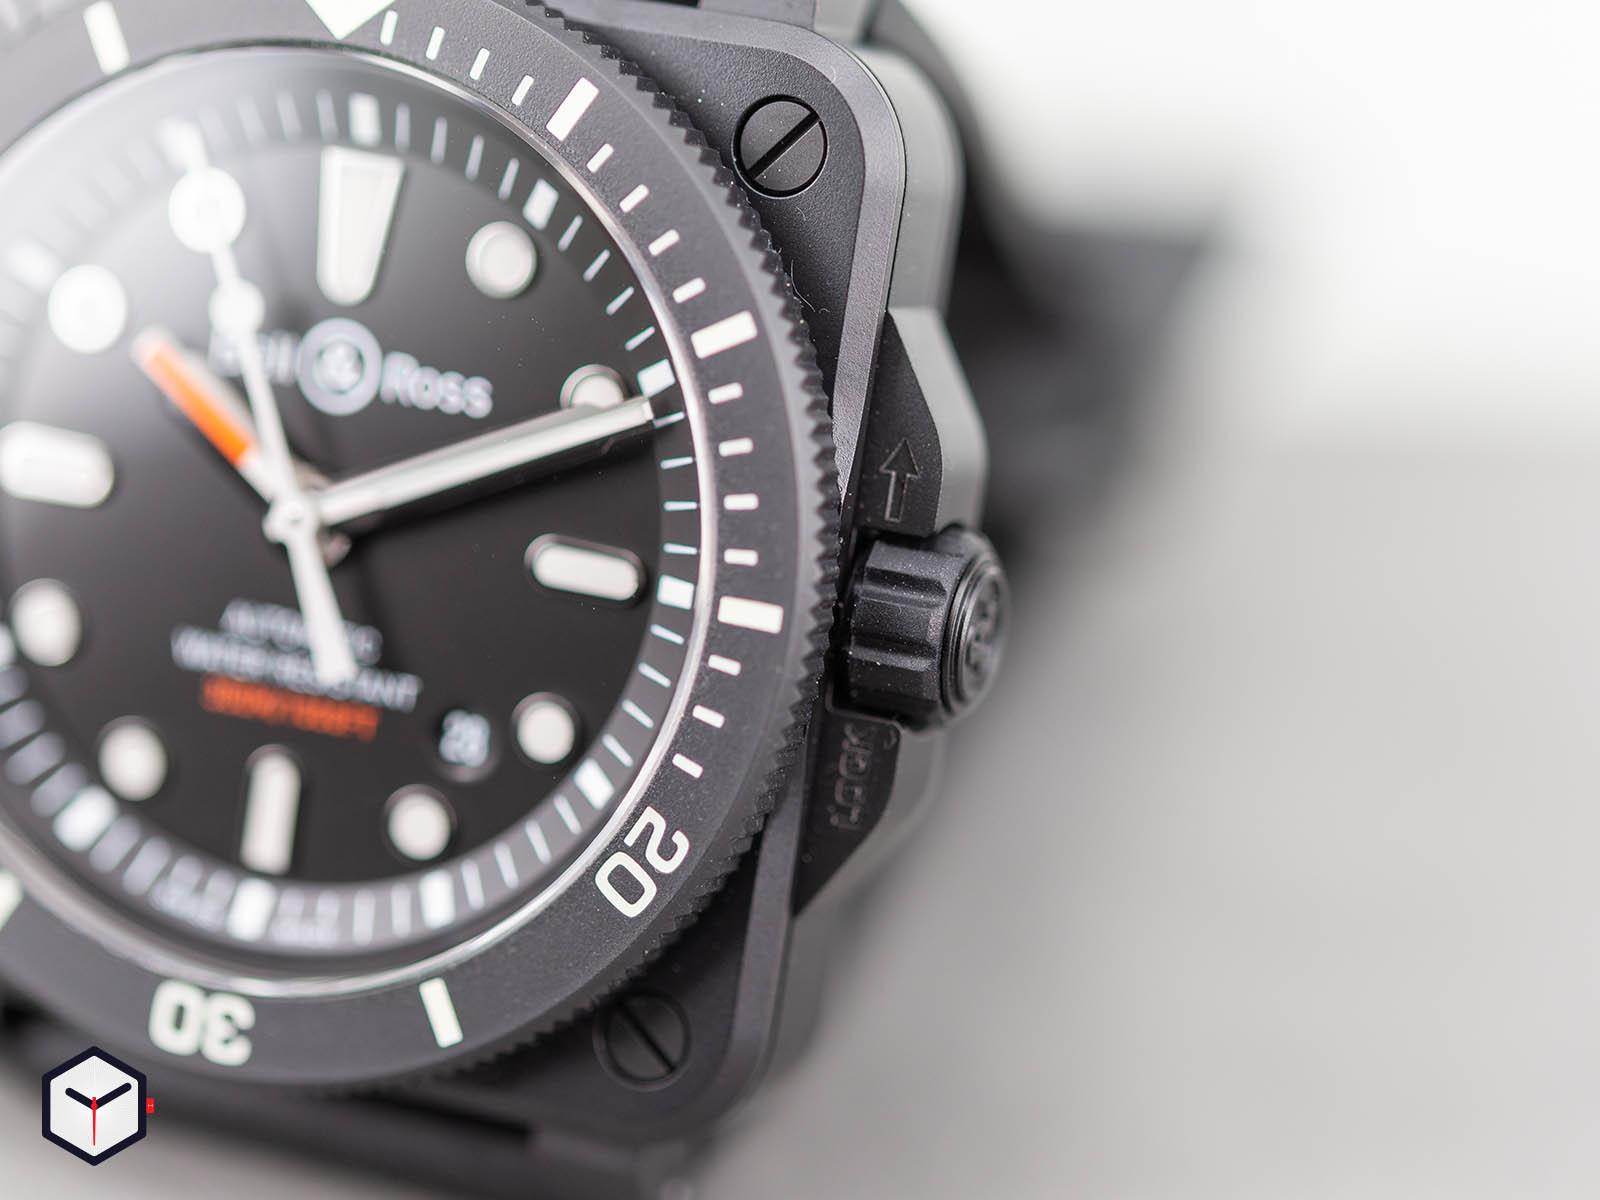 br0392-d-bl-ce-srb-bell-ross-br-03-92-diver-black-matte-4.jpg